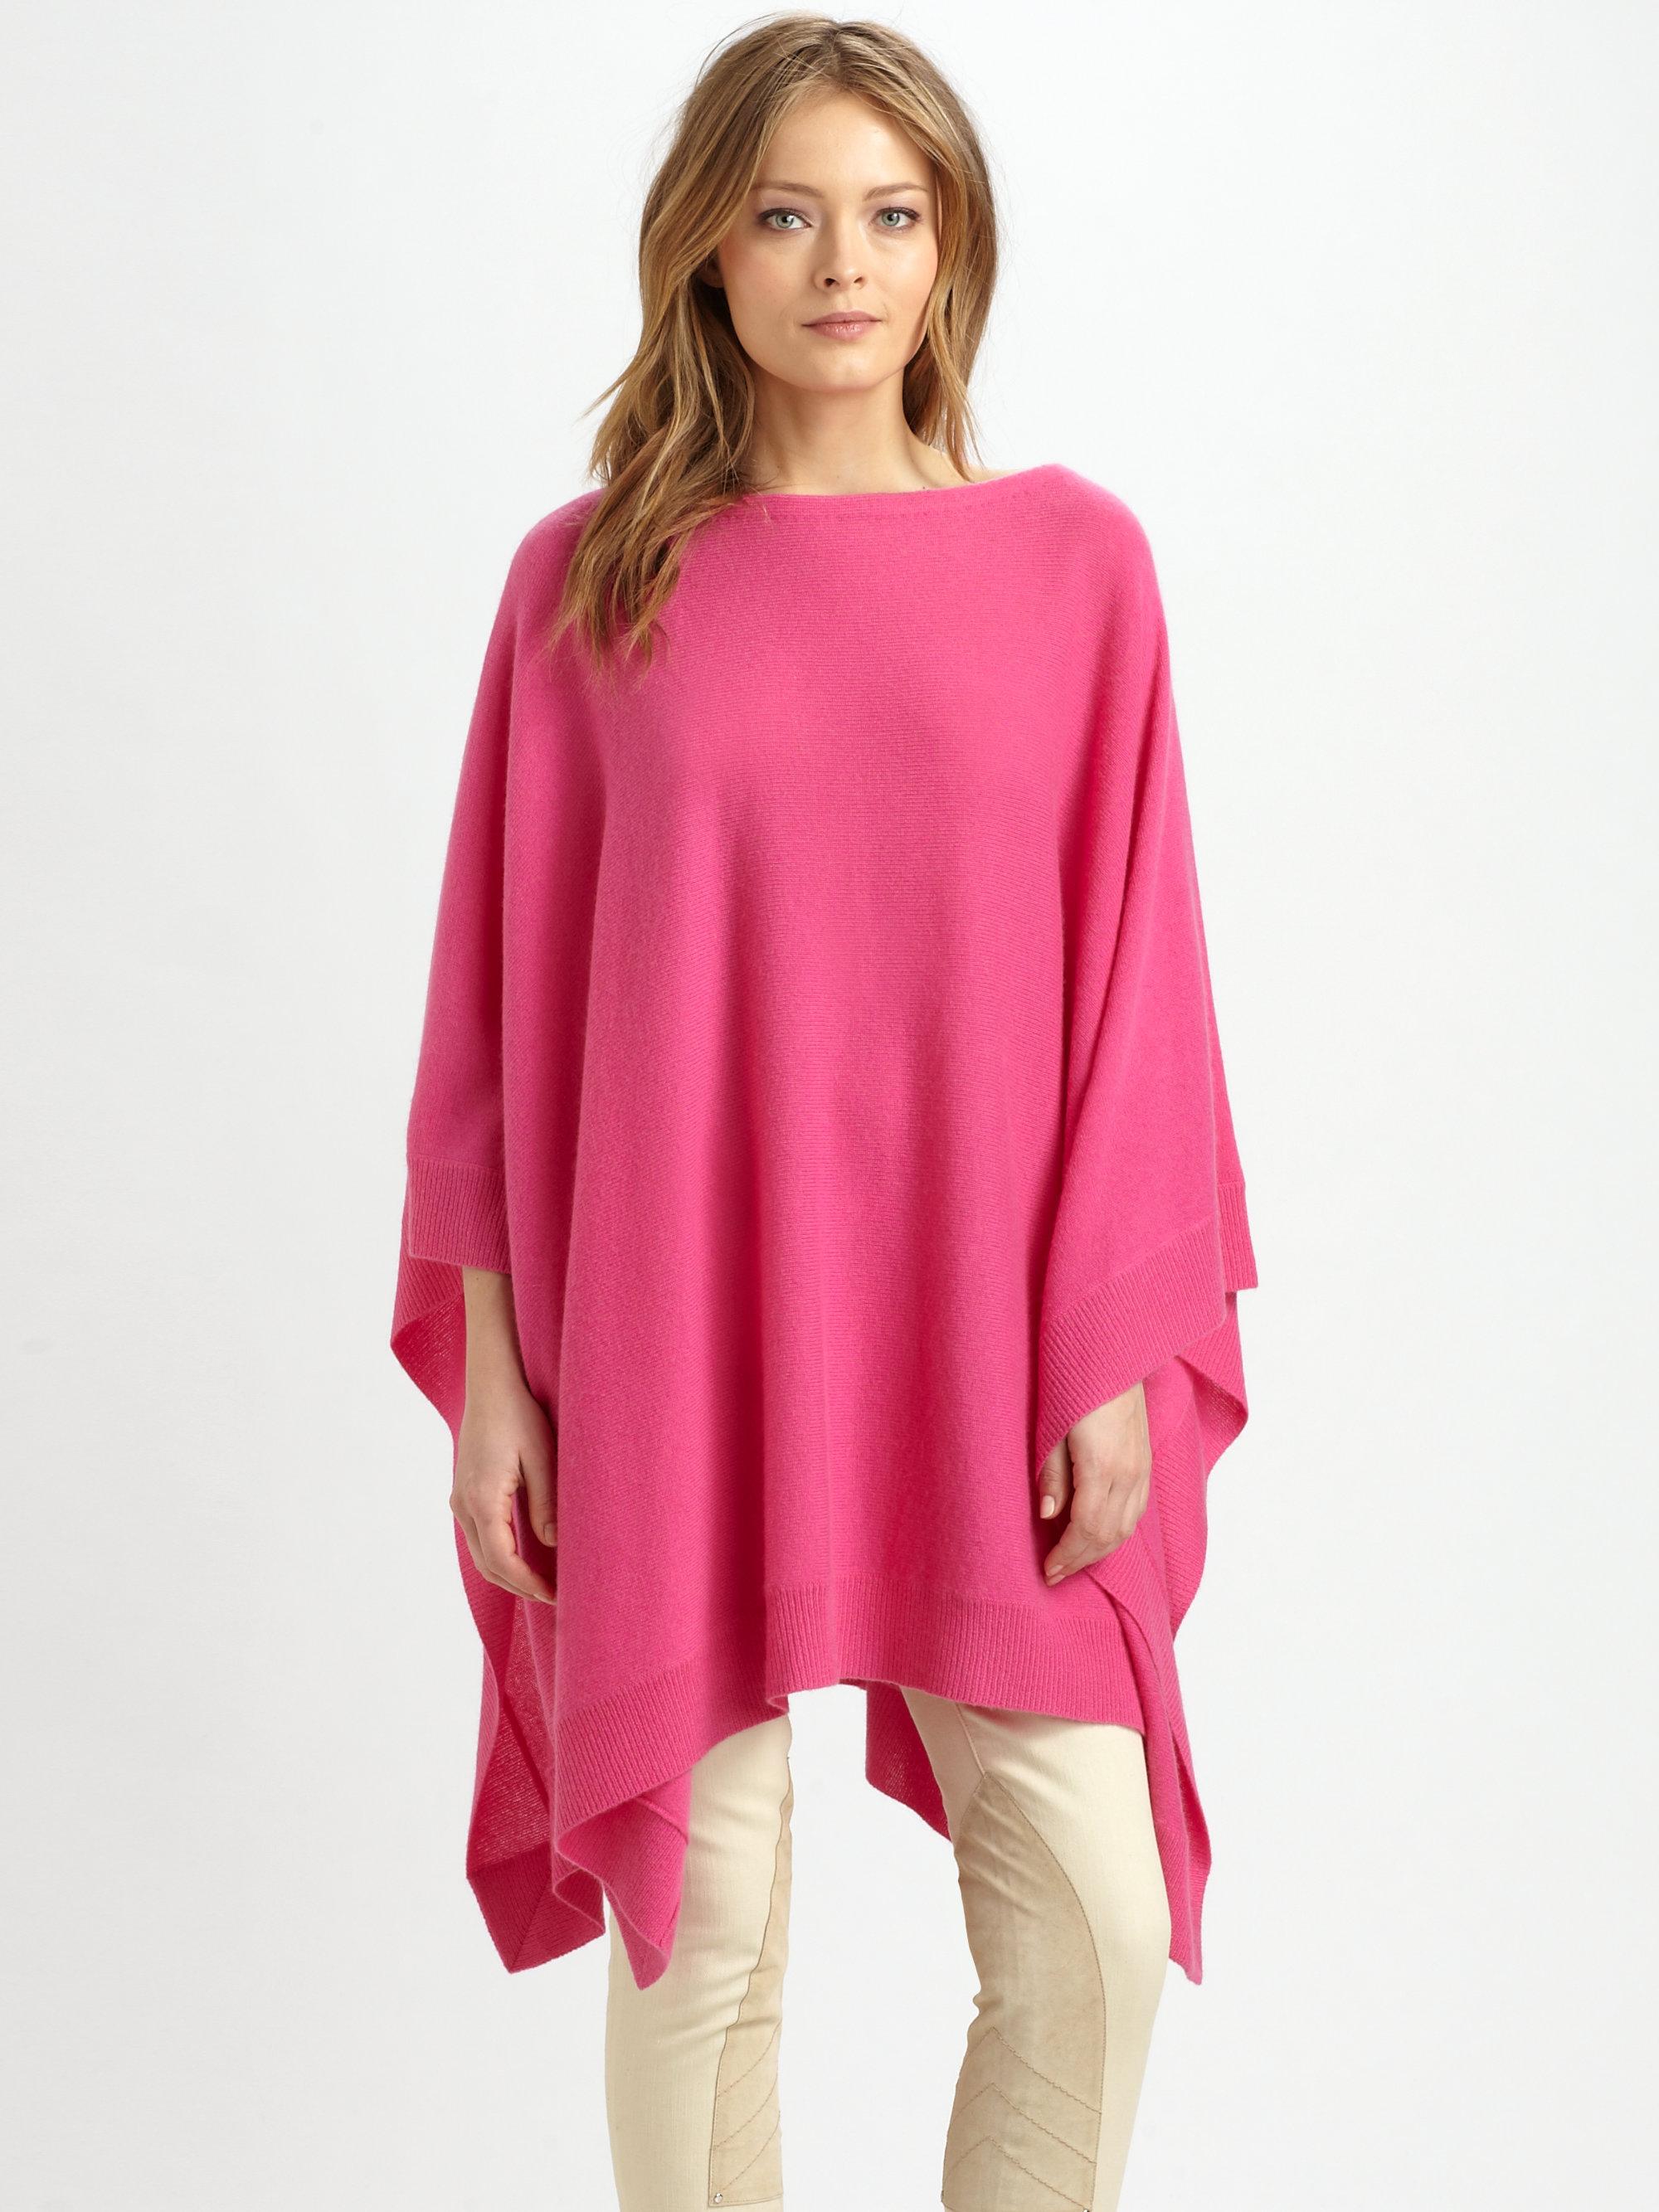 Ralph Lauren Blue Label Cashmere Poncho In Pink Lyst